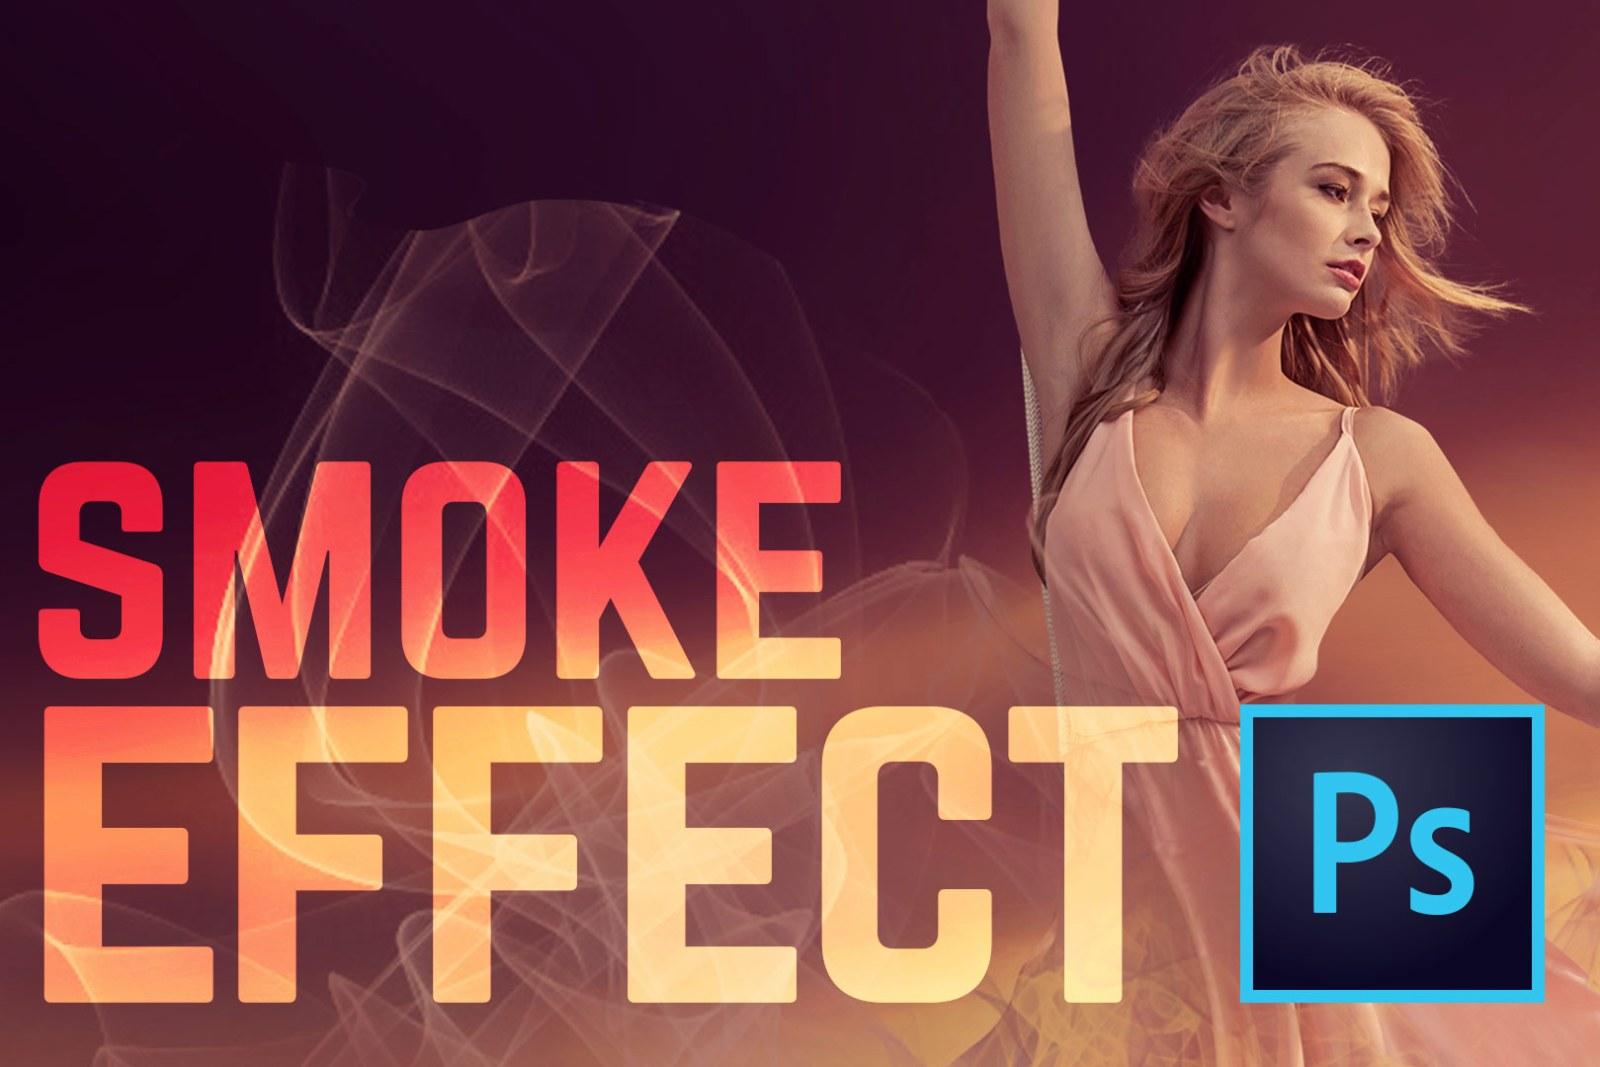 smokey-effect-thumbnail-tutvid